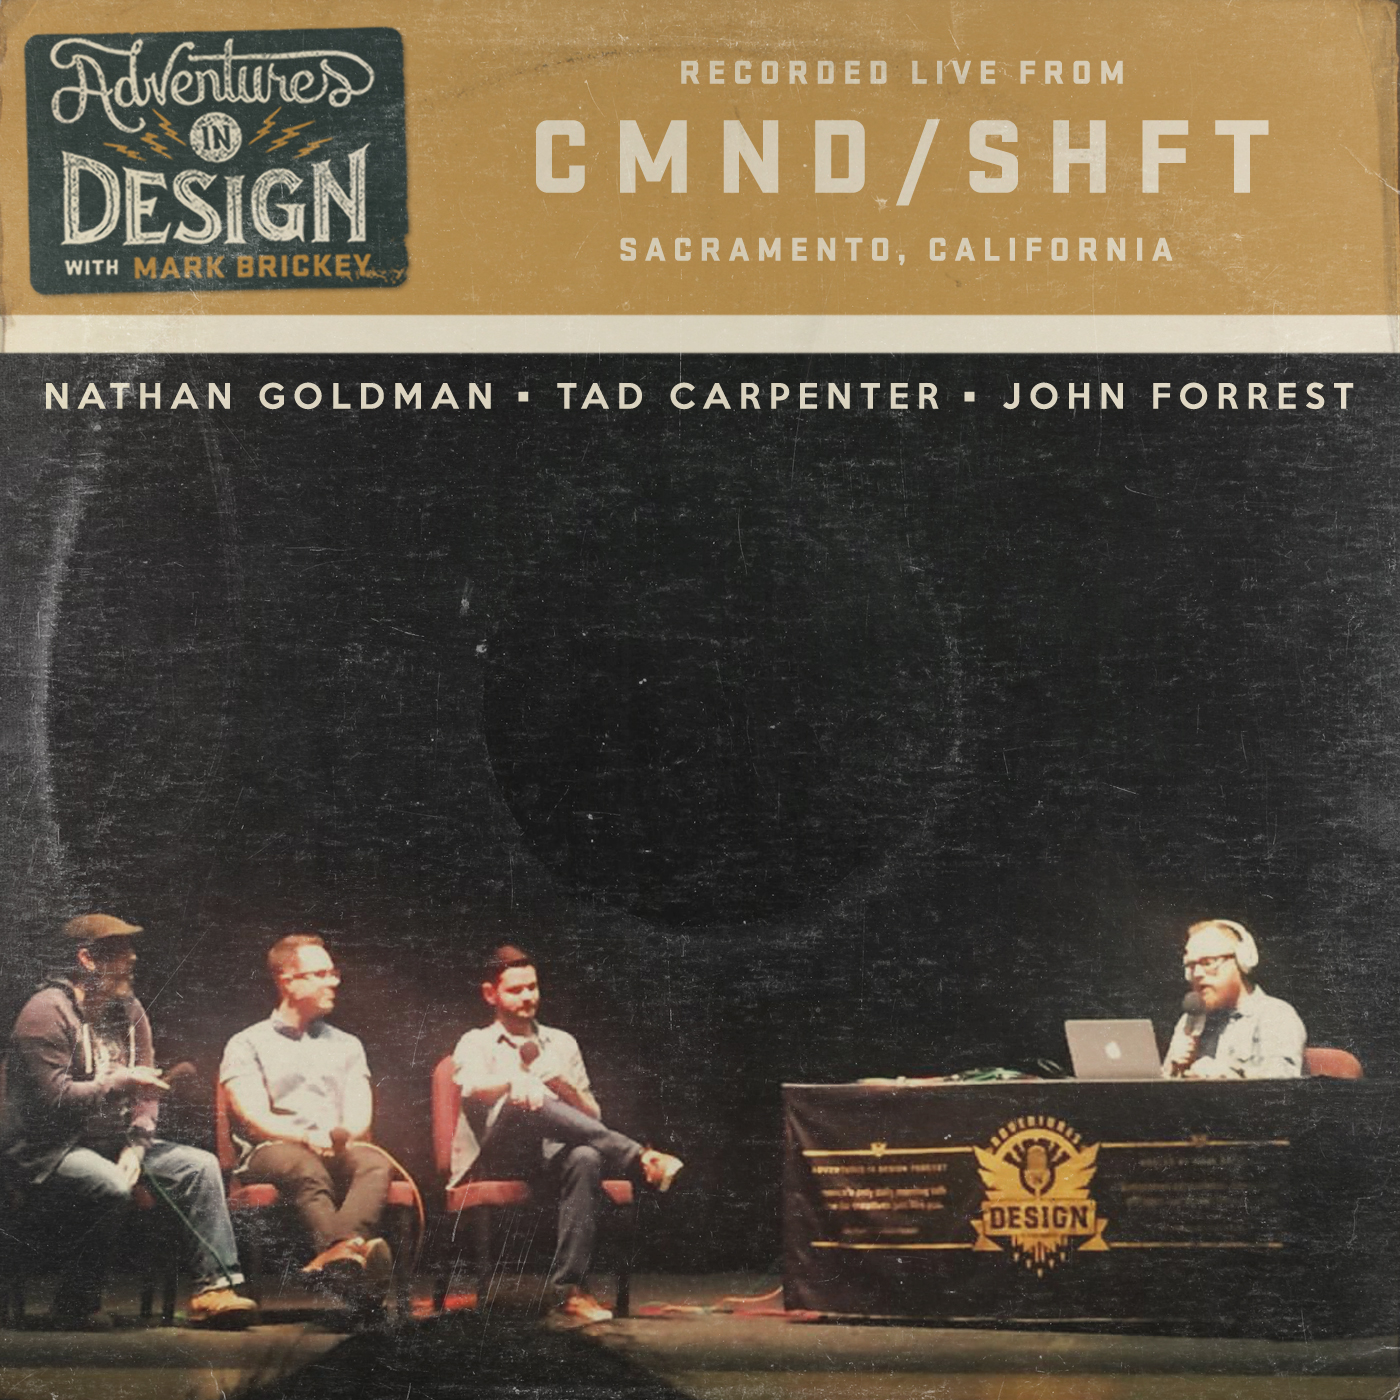 440 - CMND / SHIFT 2016 - Nathan Goldman, Tad Carpenter and John Forrest